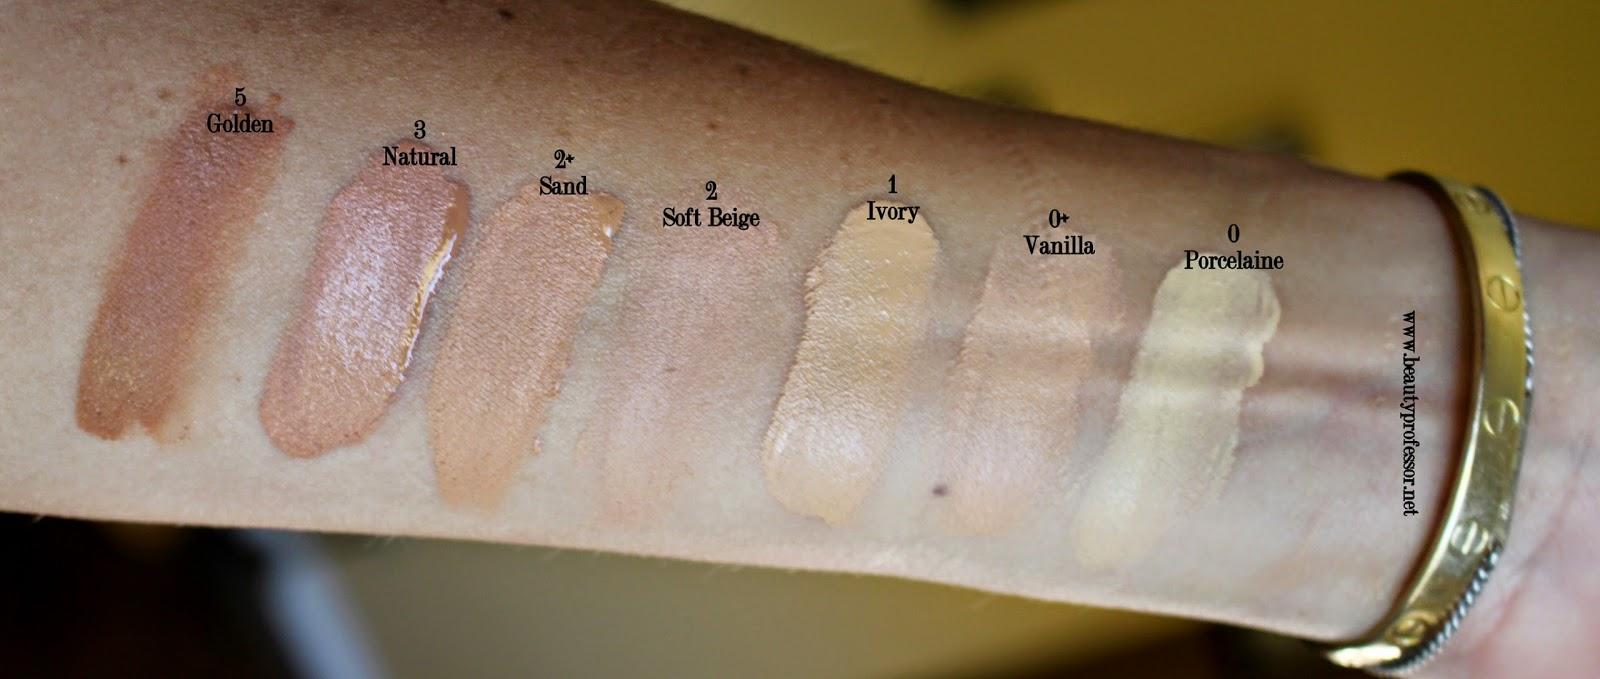 Sisley Makeup Reviews Mugeek Vidalondon